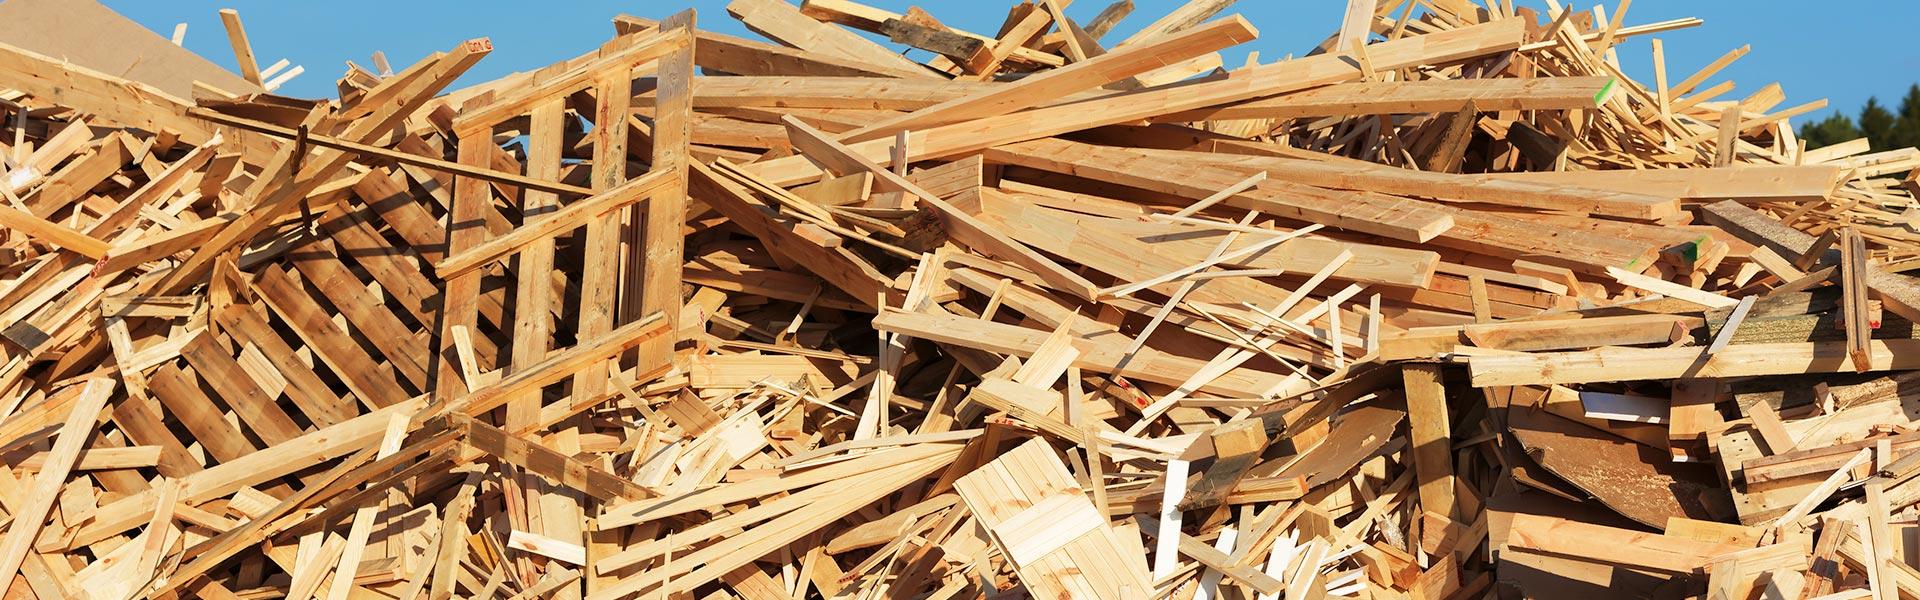 Recycled Wood Probio Energy International